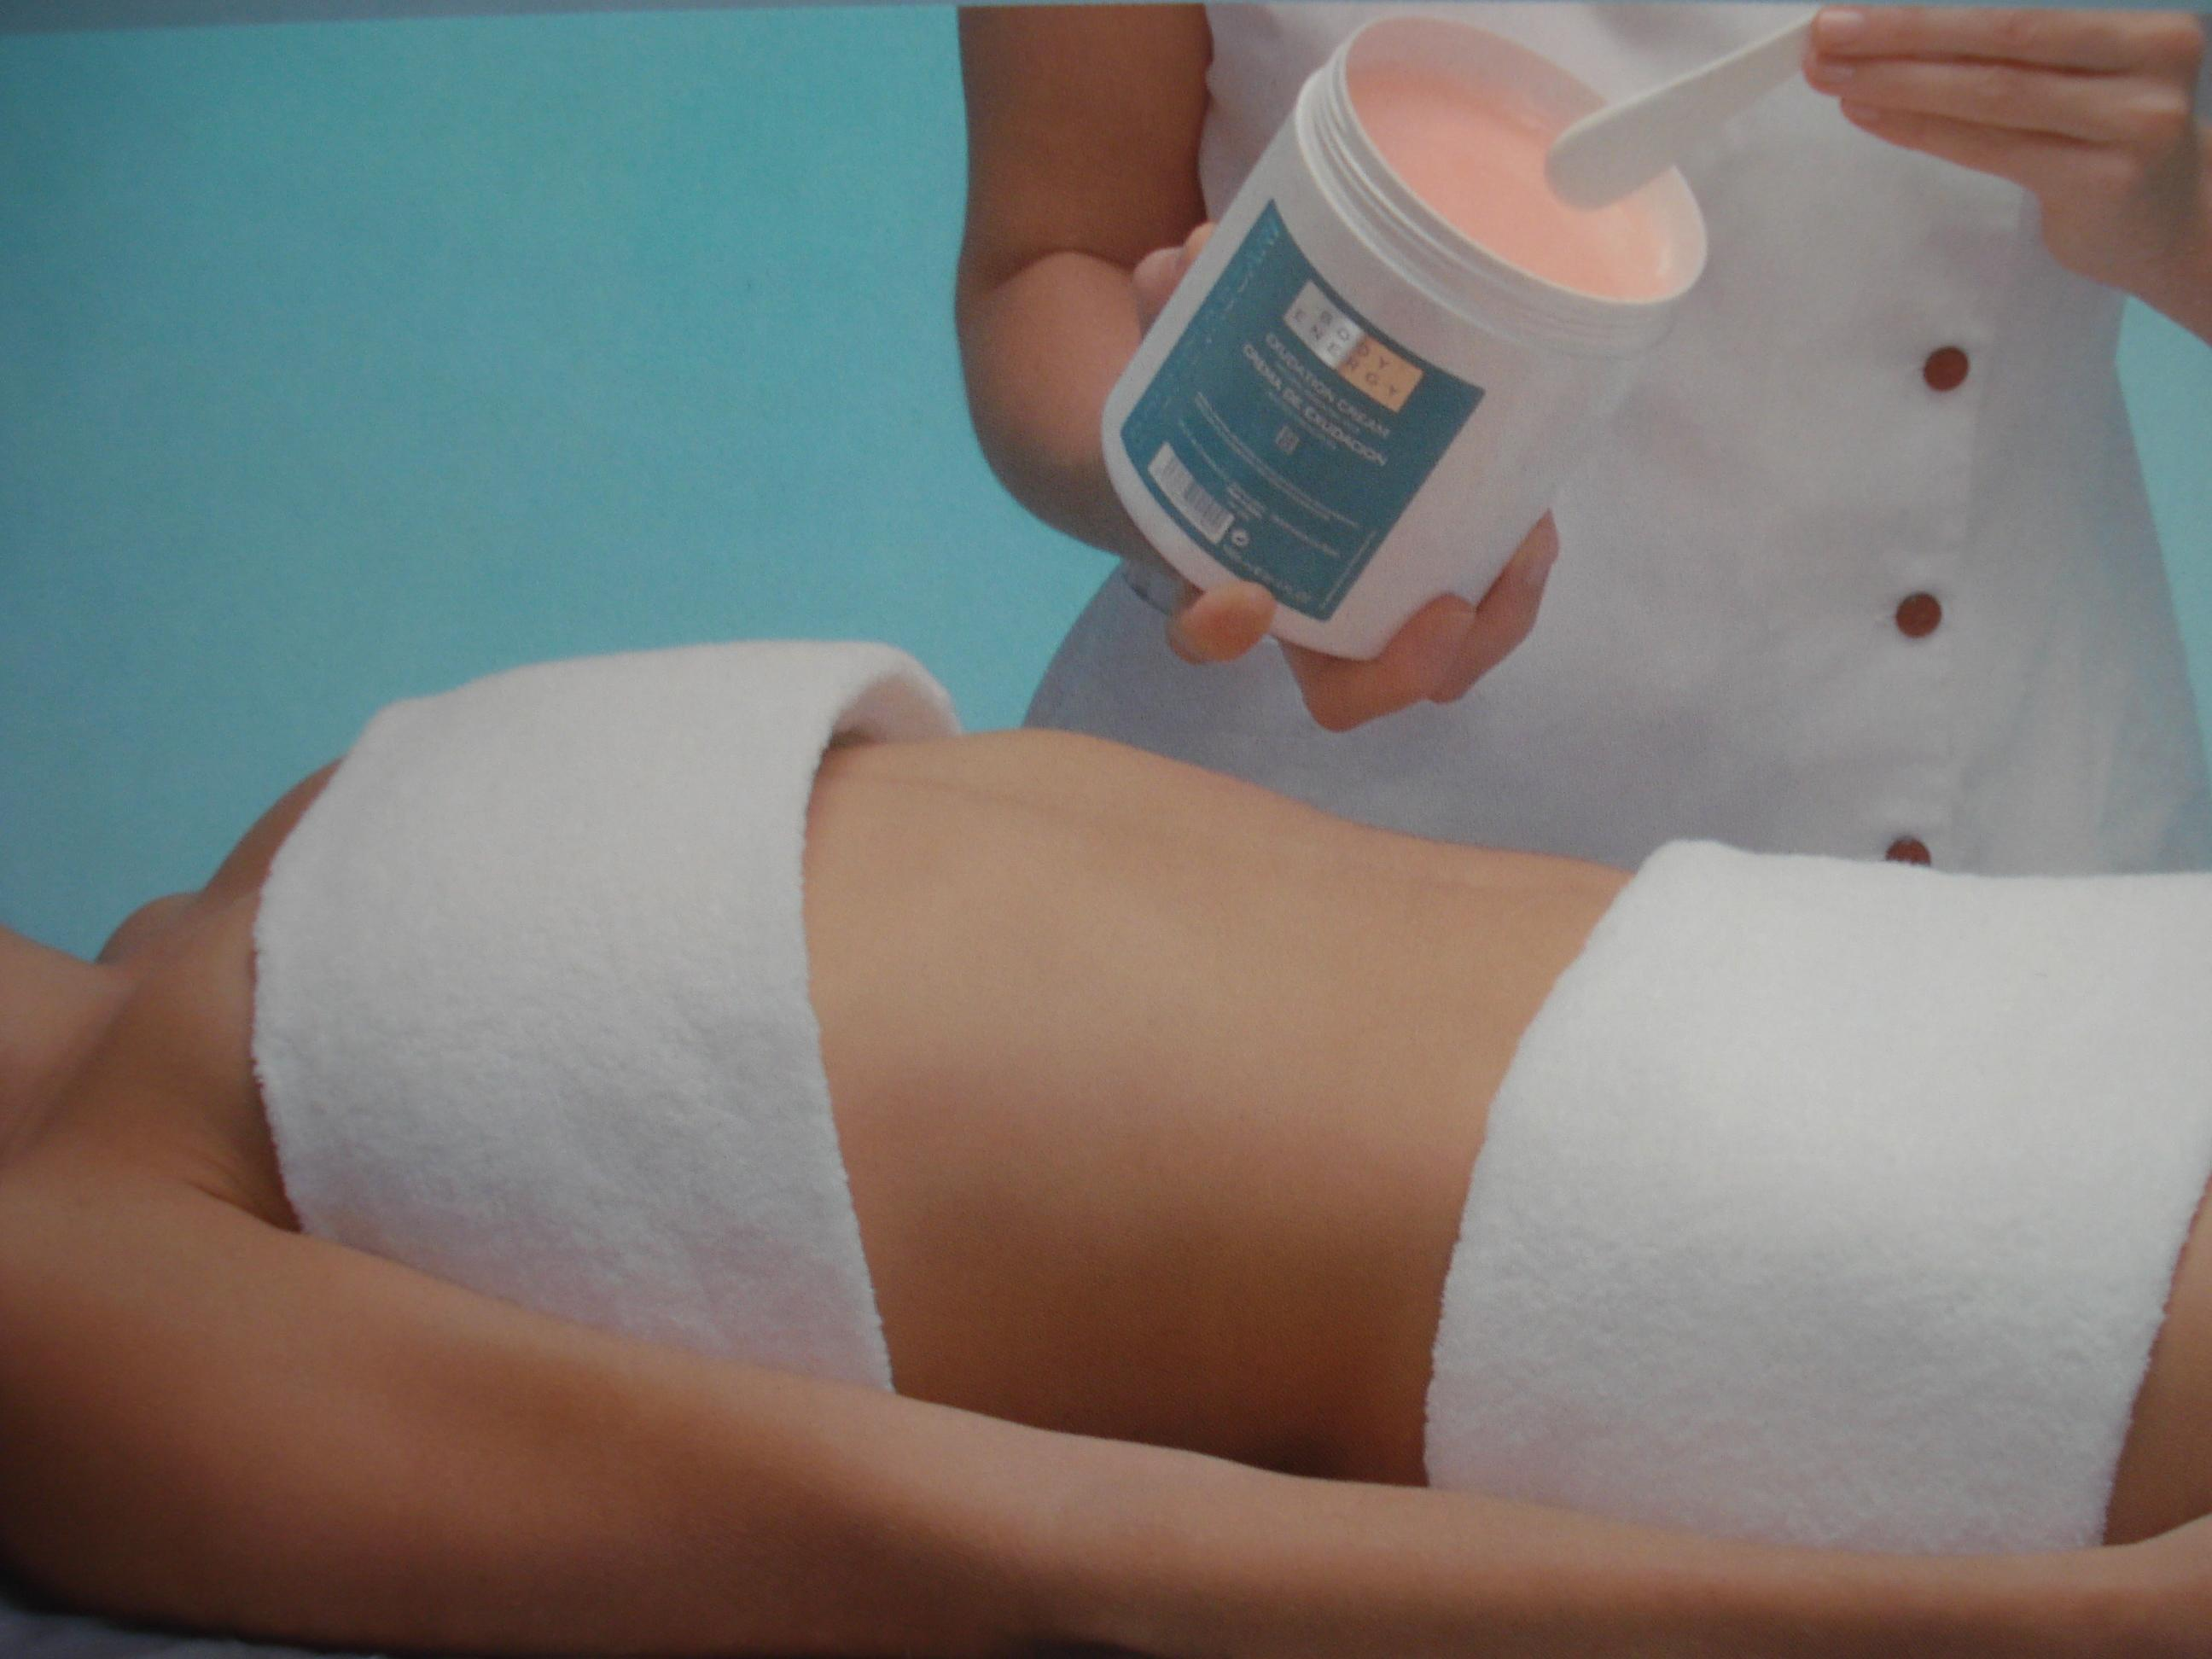 Servicii de masaj, tratamente corporale, cosmetica faciala